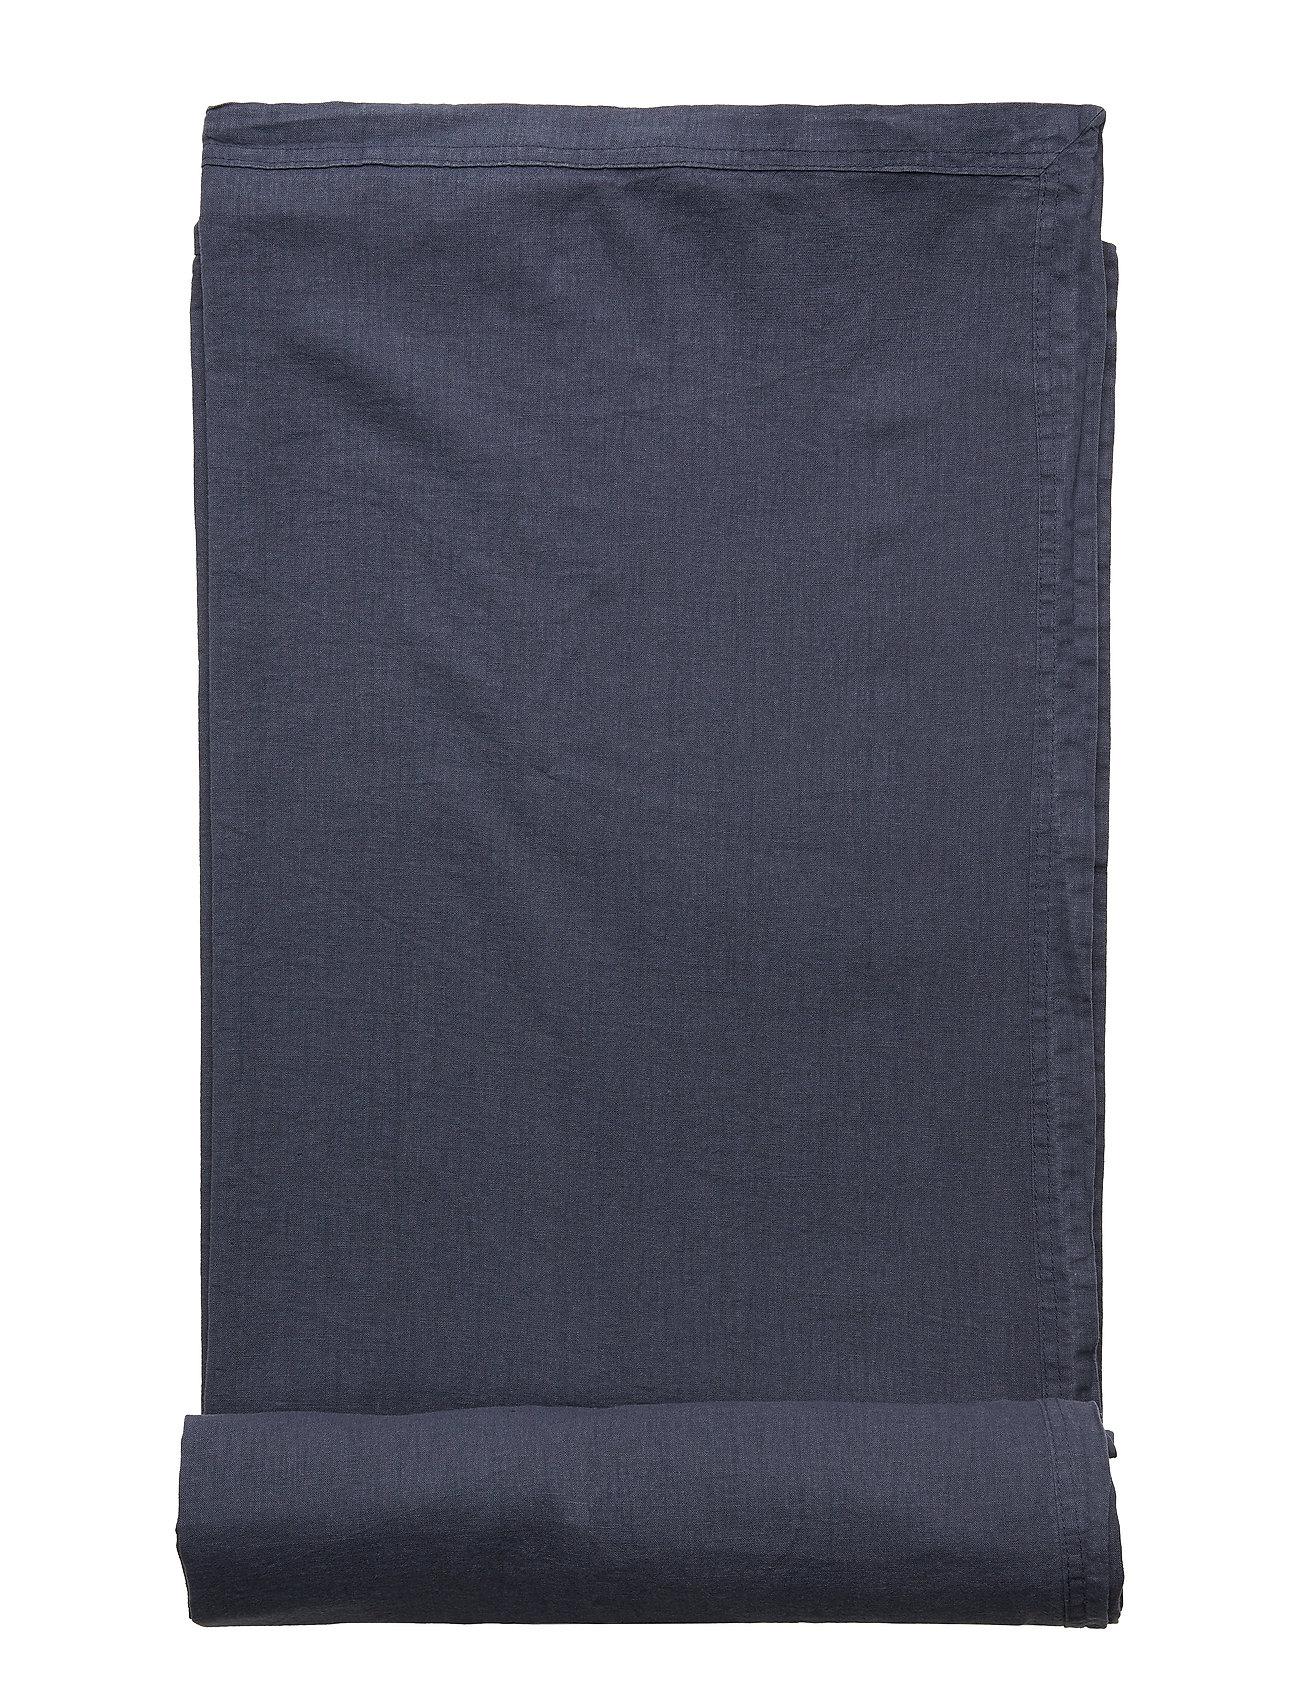 Gripsholm TABLE CLOTH LINEN BLEND - OMBRE BLUE